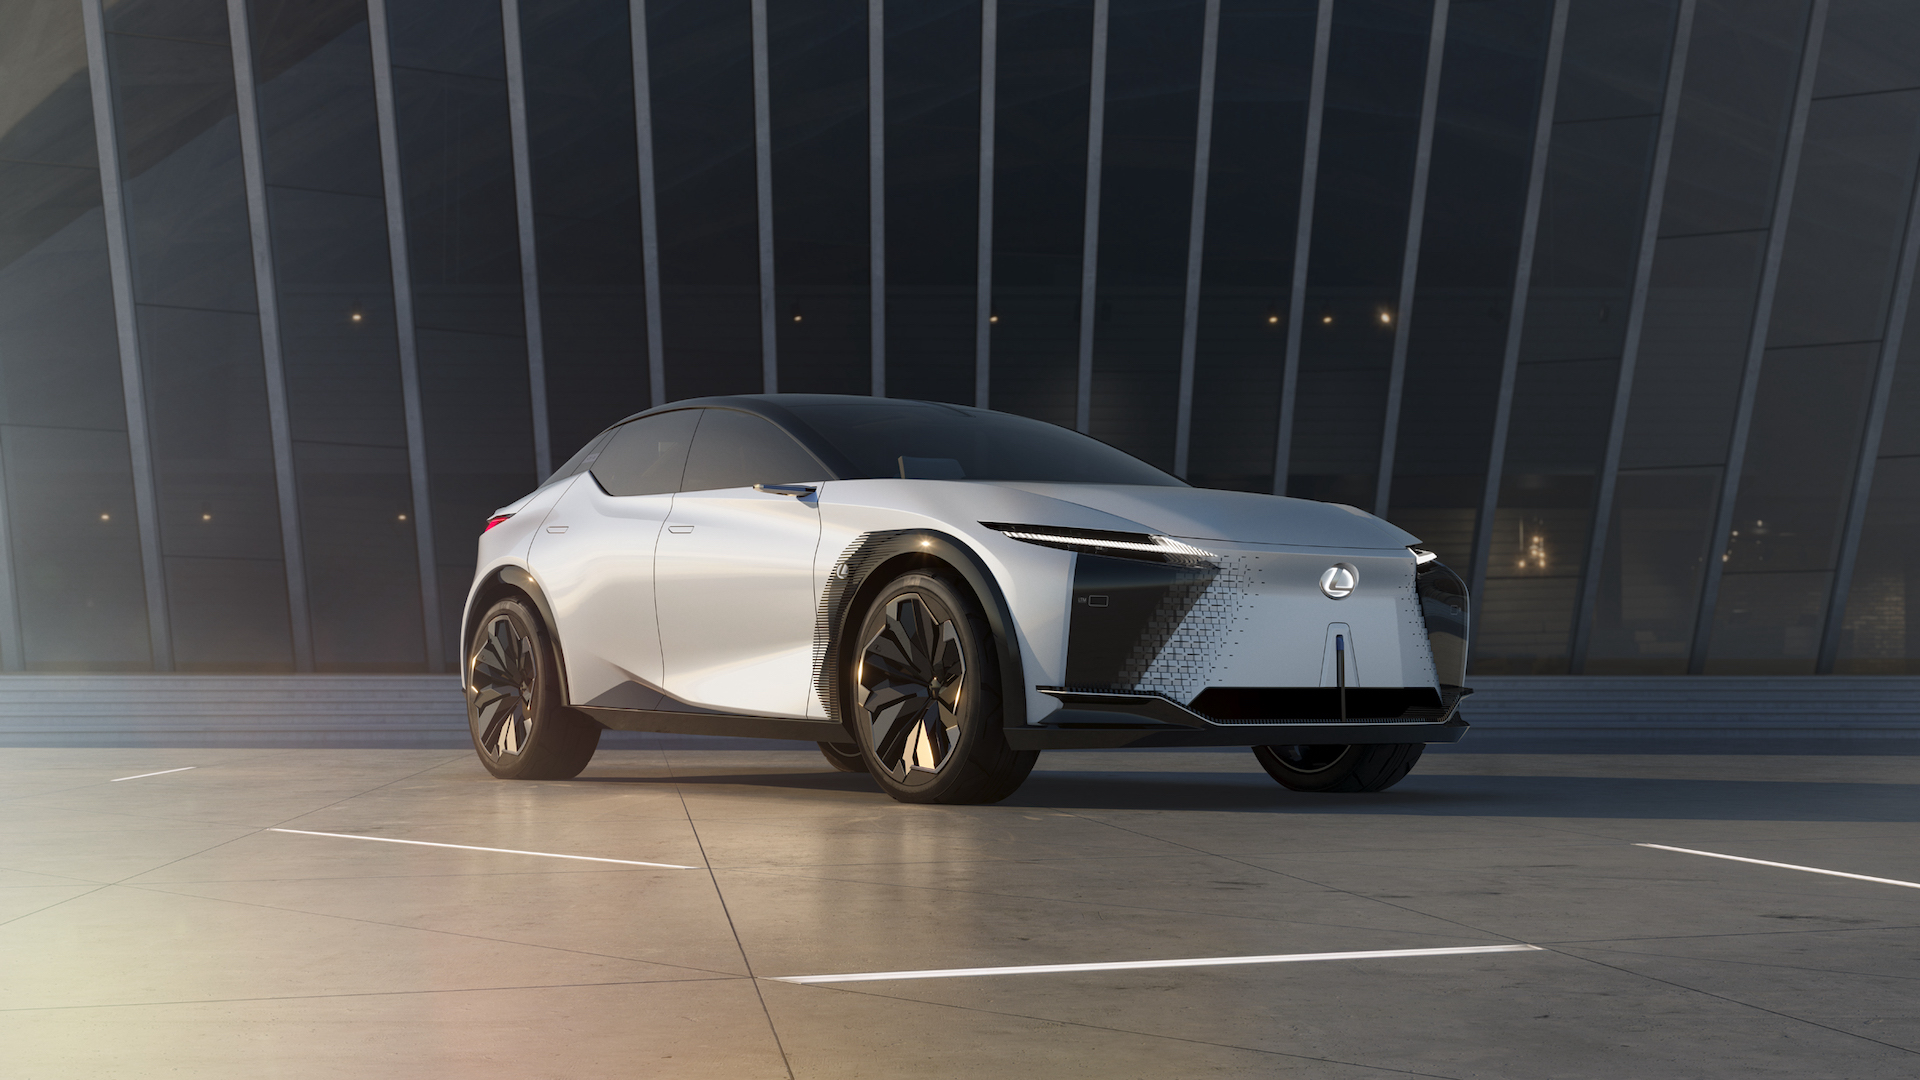 Lexus previews design direction for future EVs with LF-Z Electrified concept